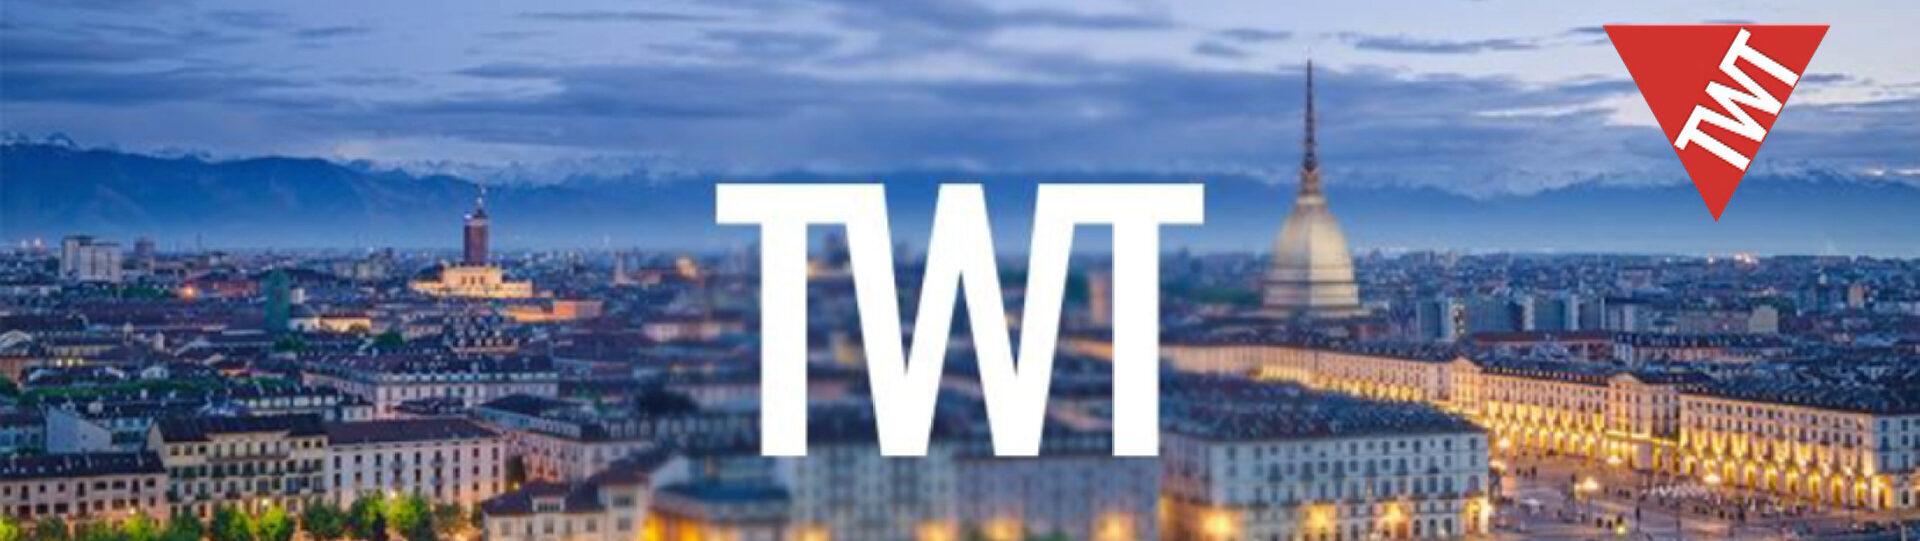 Torino Web TV